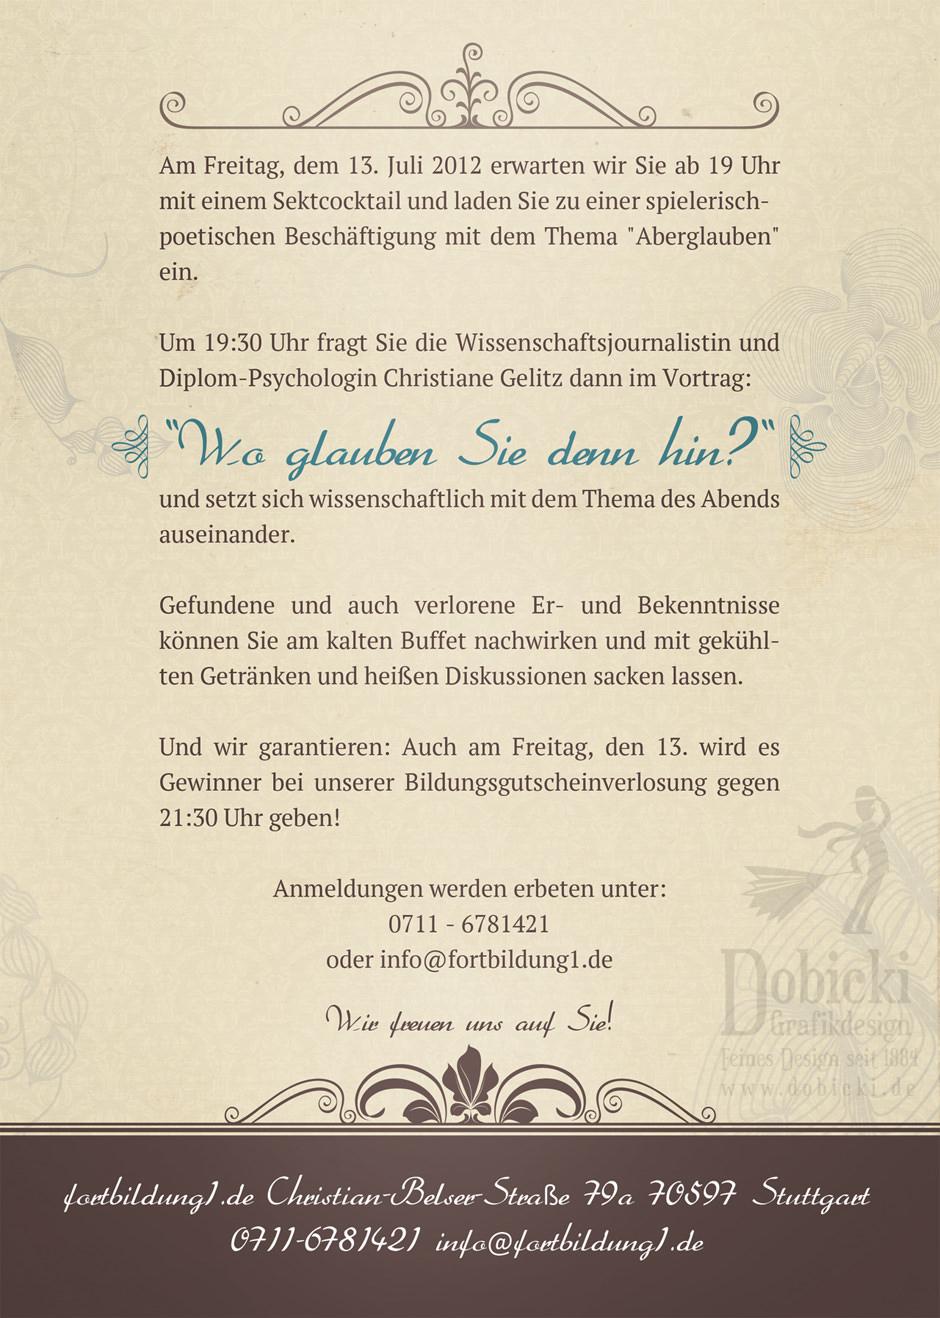 einladungskarte fb1 2012 rueck 2